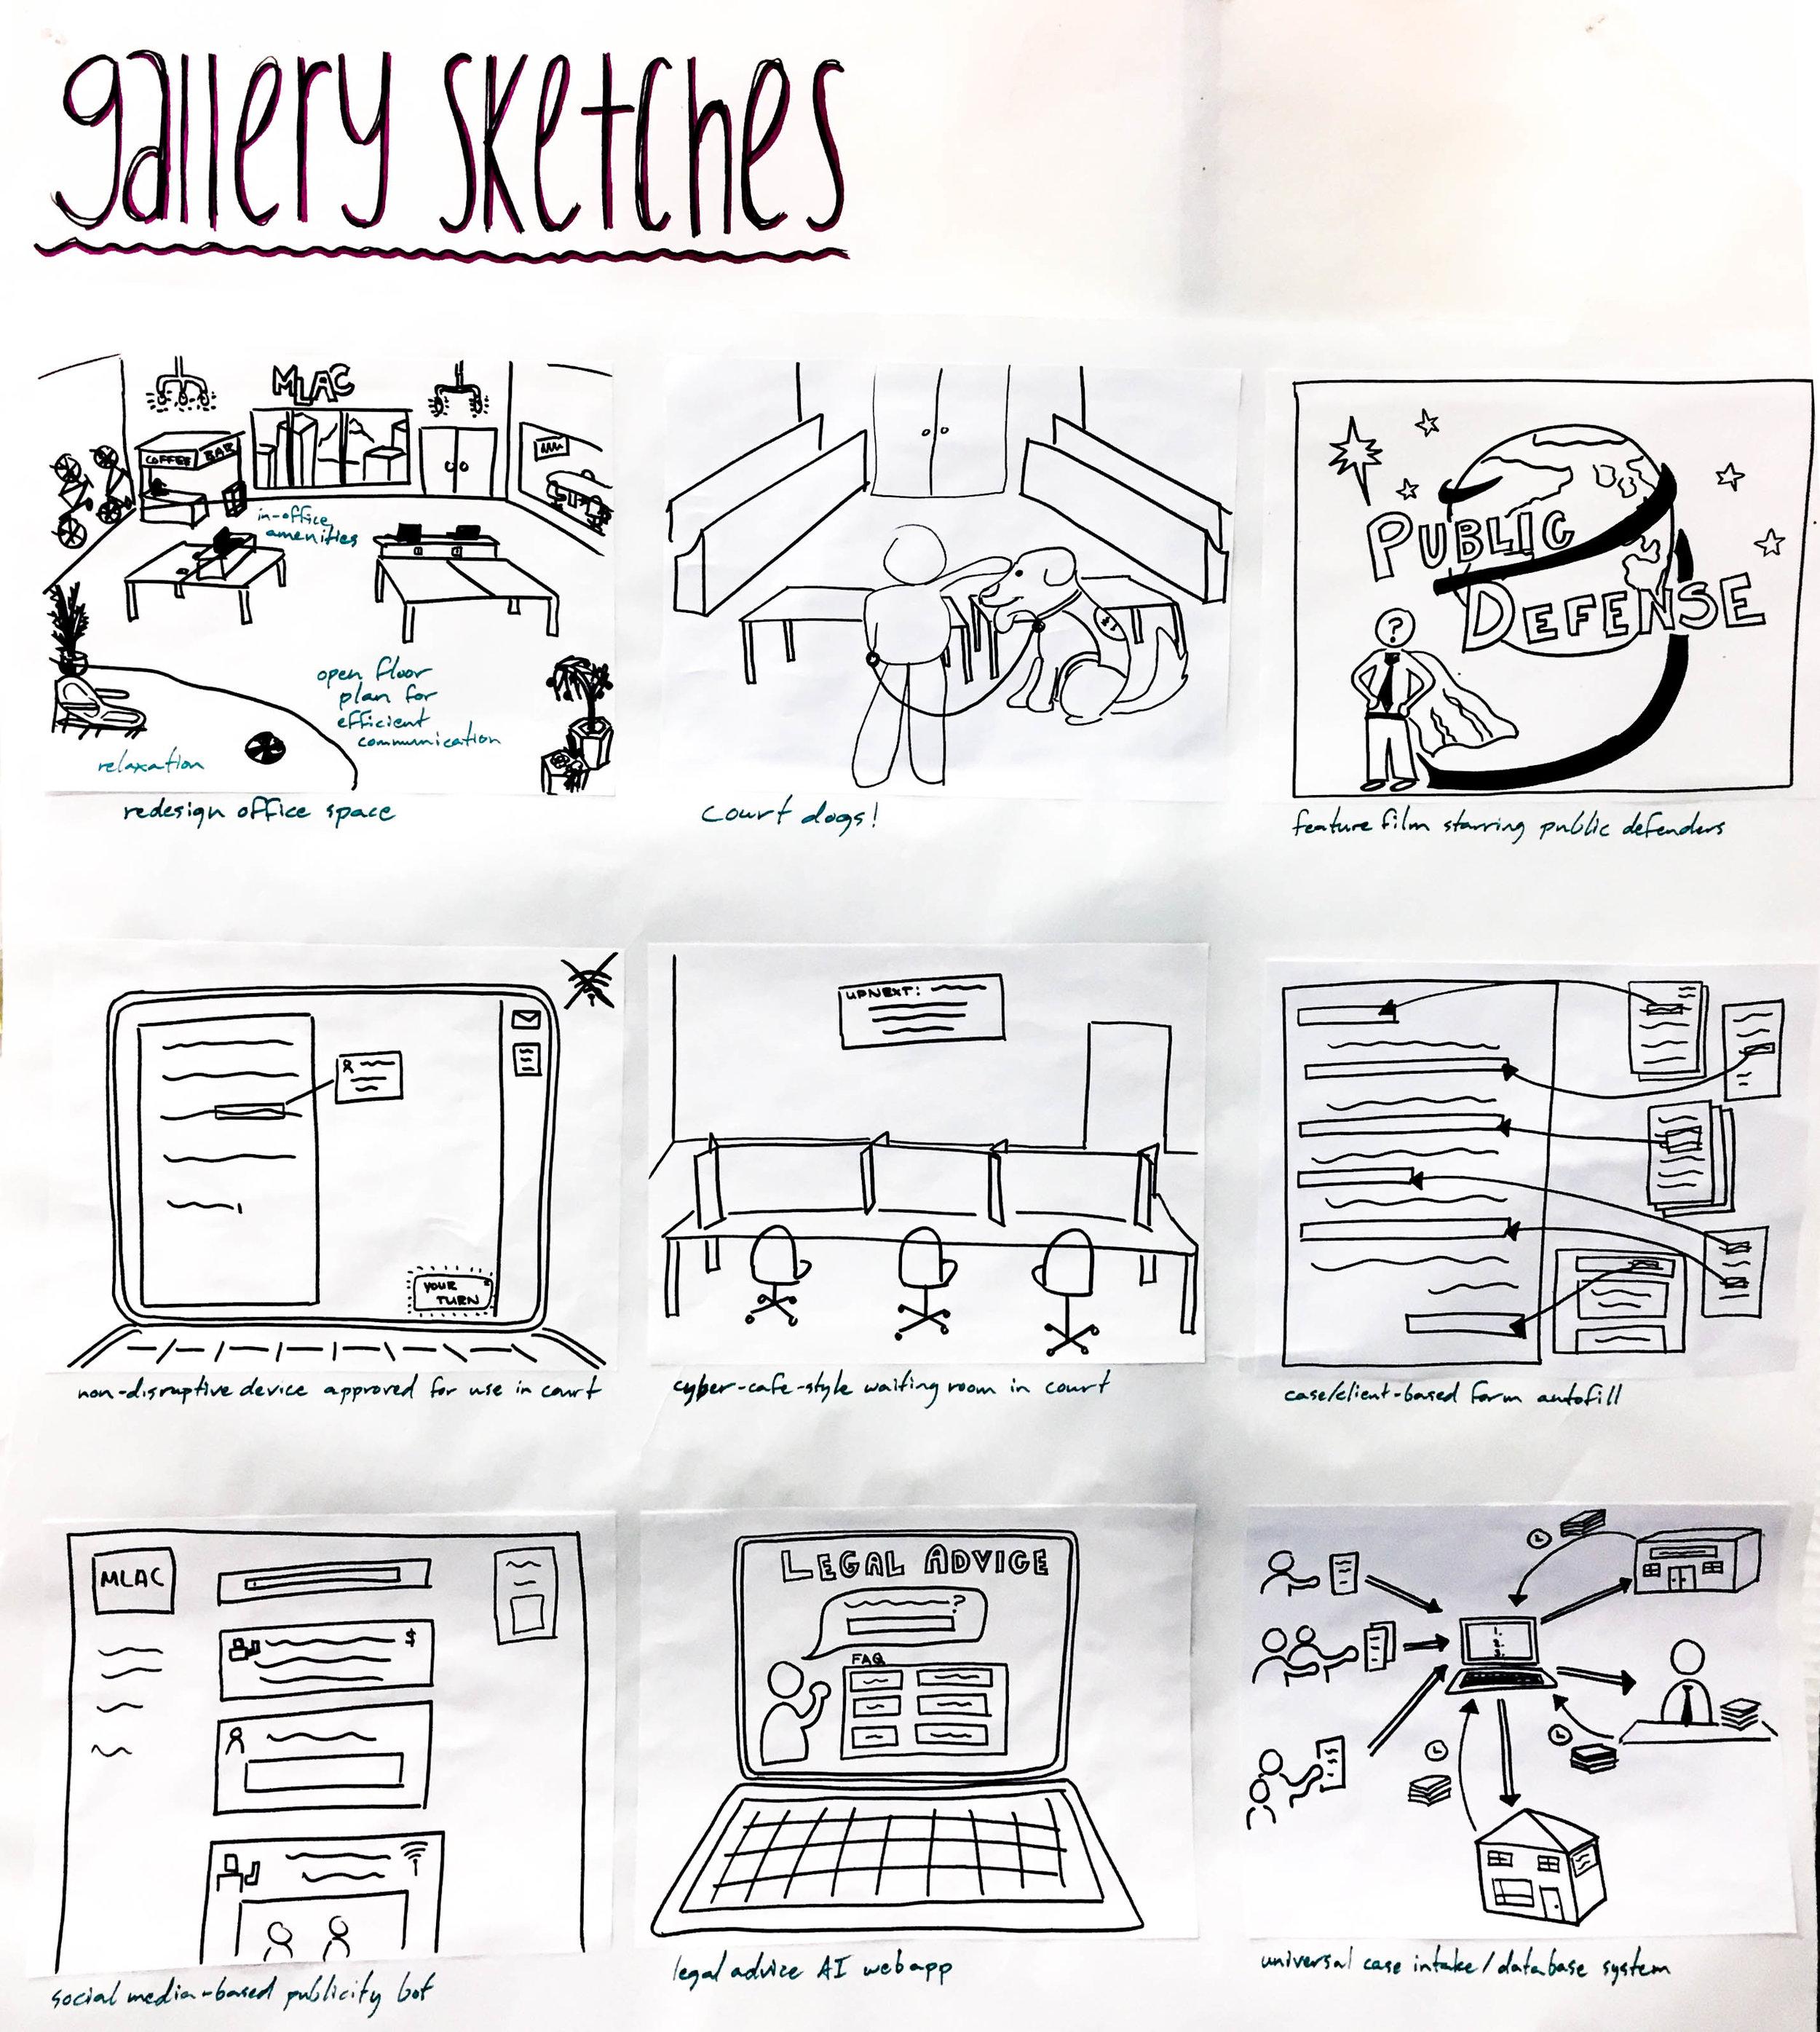 Gallery Sketches.jpg